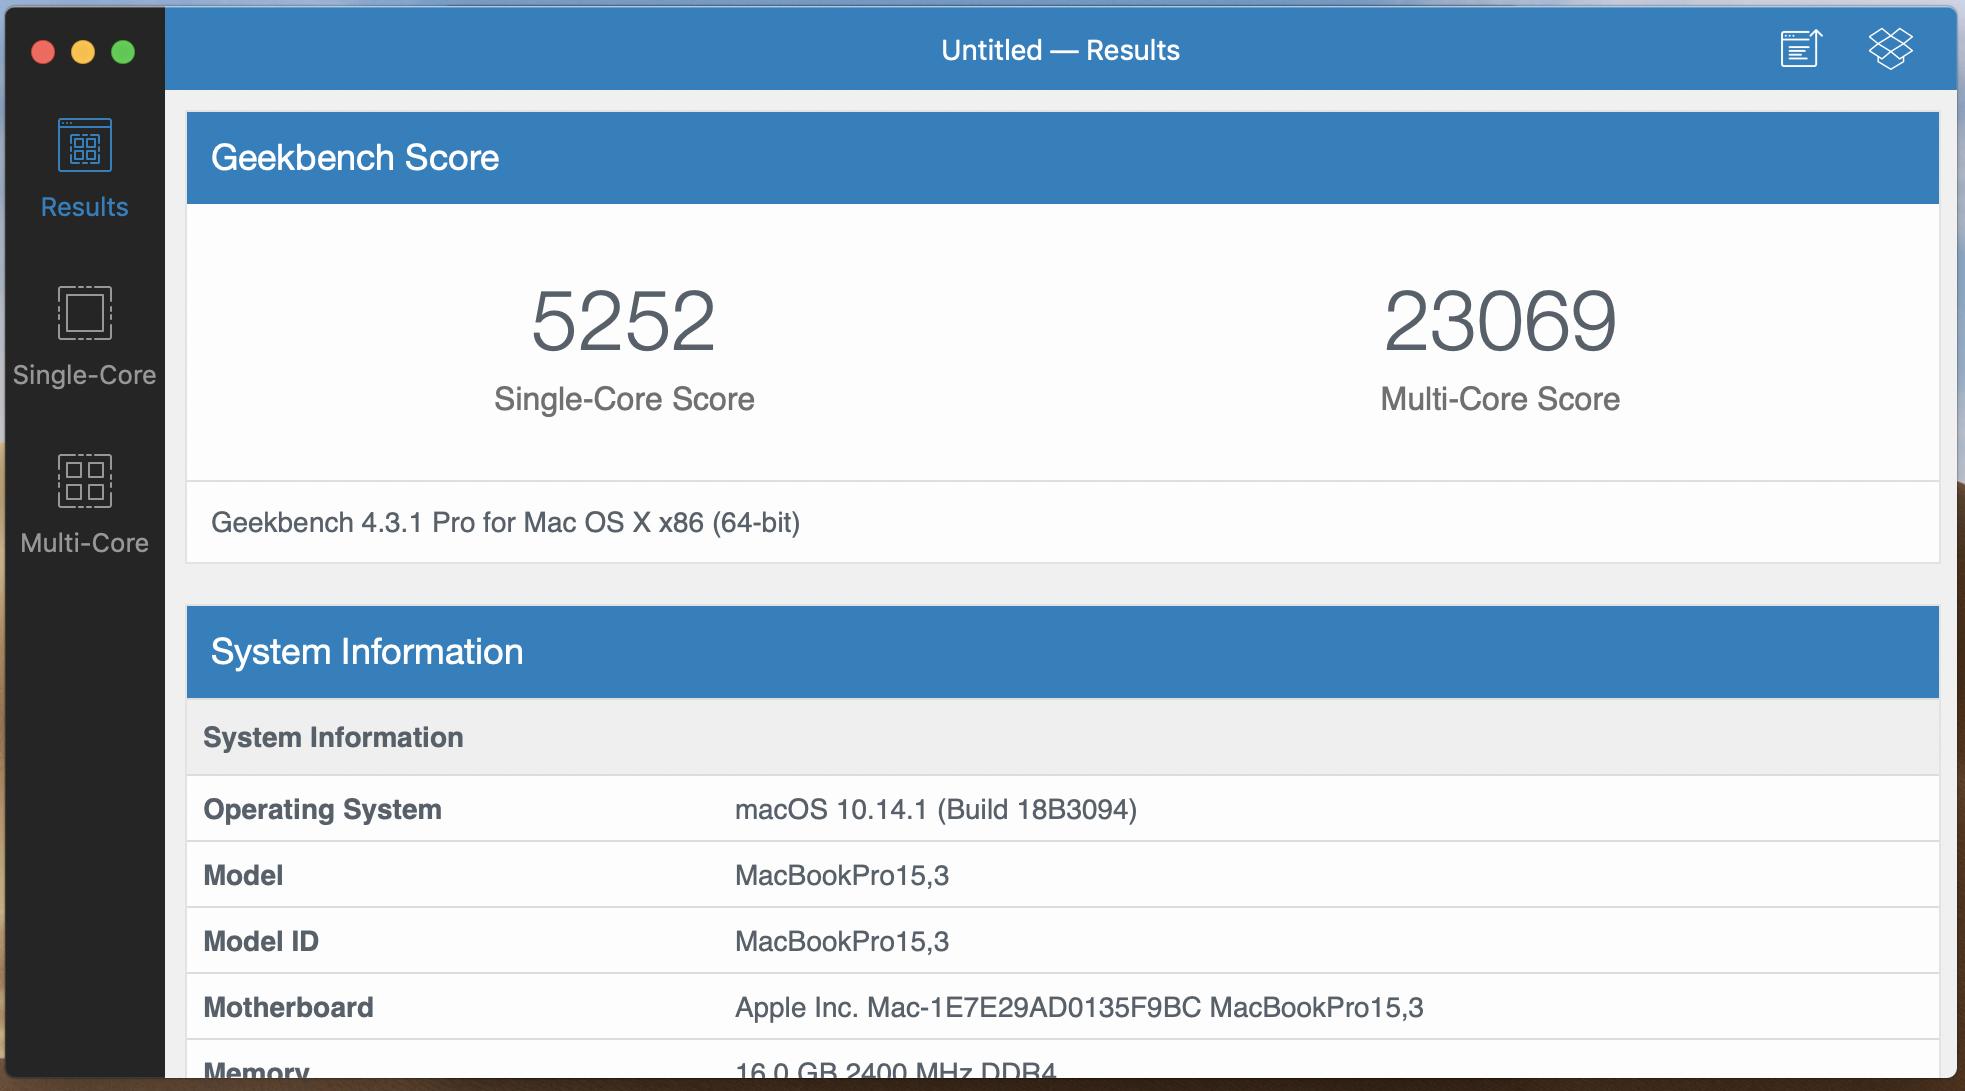 Media asset in full size related to 3dfxzone.it news item entitled as follows: Testato con Geekbench il MacBook Pro da 15-inch con GPU AMD Radeon Pro Vega 20 | Image Name: news28995_Apple-MacBook-Pro-Geekbench_2.png